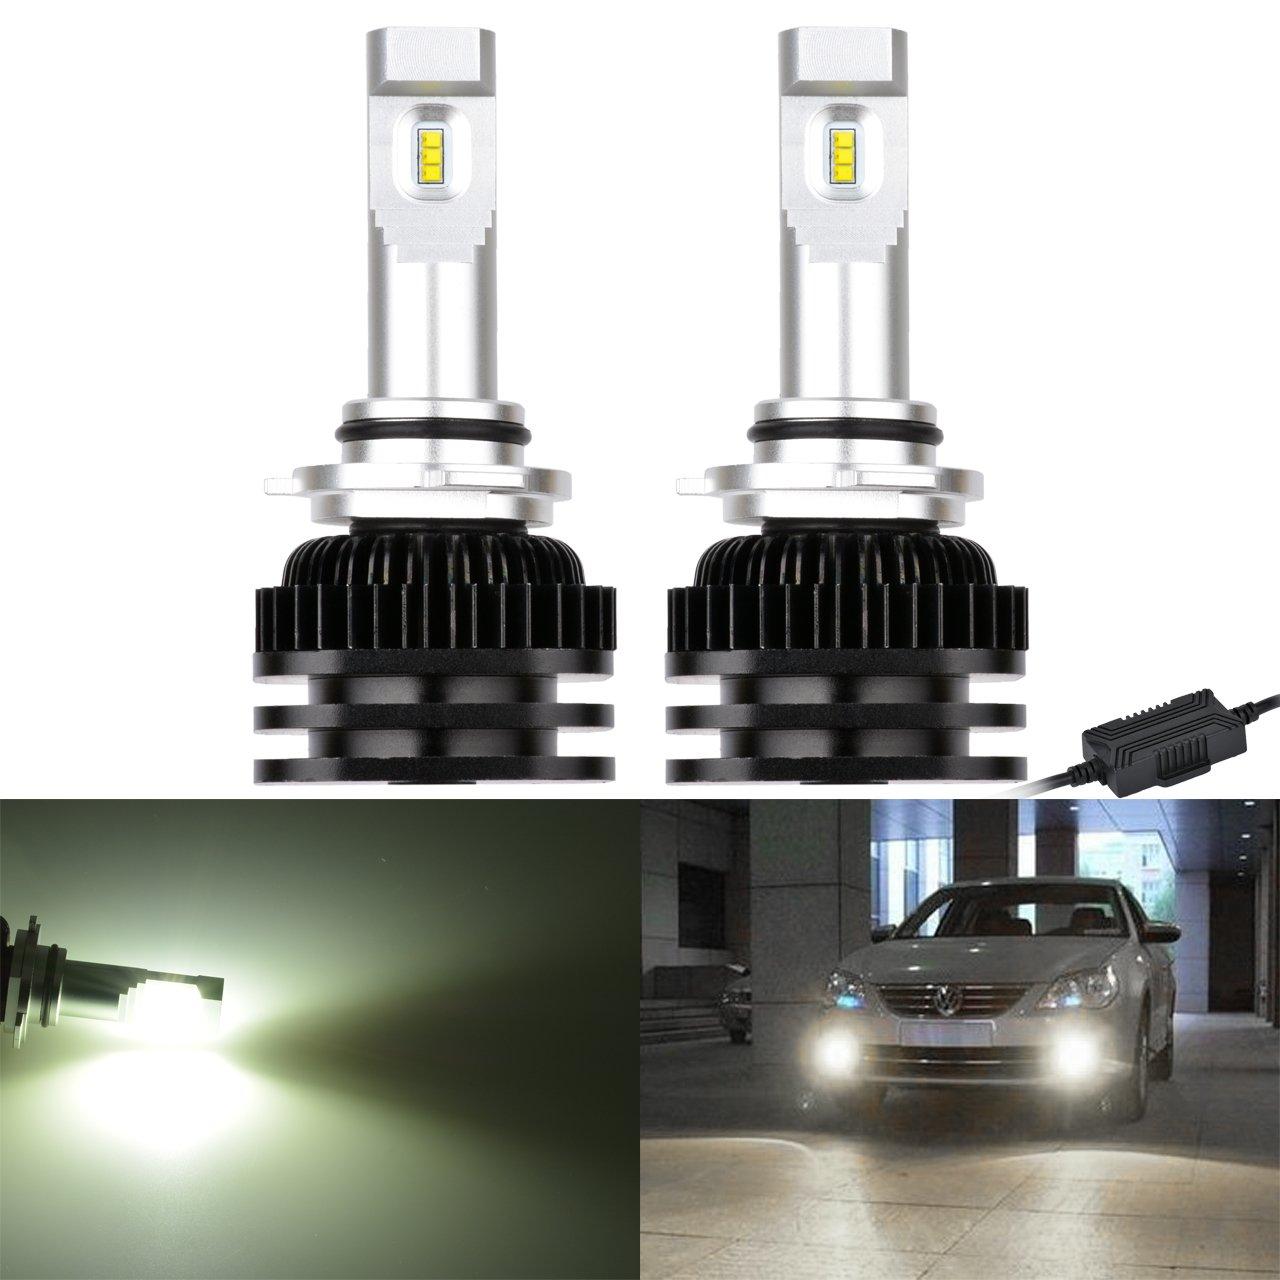 NGCAT 2PCS chip LED High Bright PSC 9005/9006/H10/Canbus senza errori nebbia luce LED Lampadina lampadine di guida luci diurne lampada kit 6000/K 2000/lm//Xenon Bulb bianco